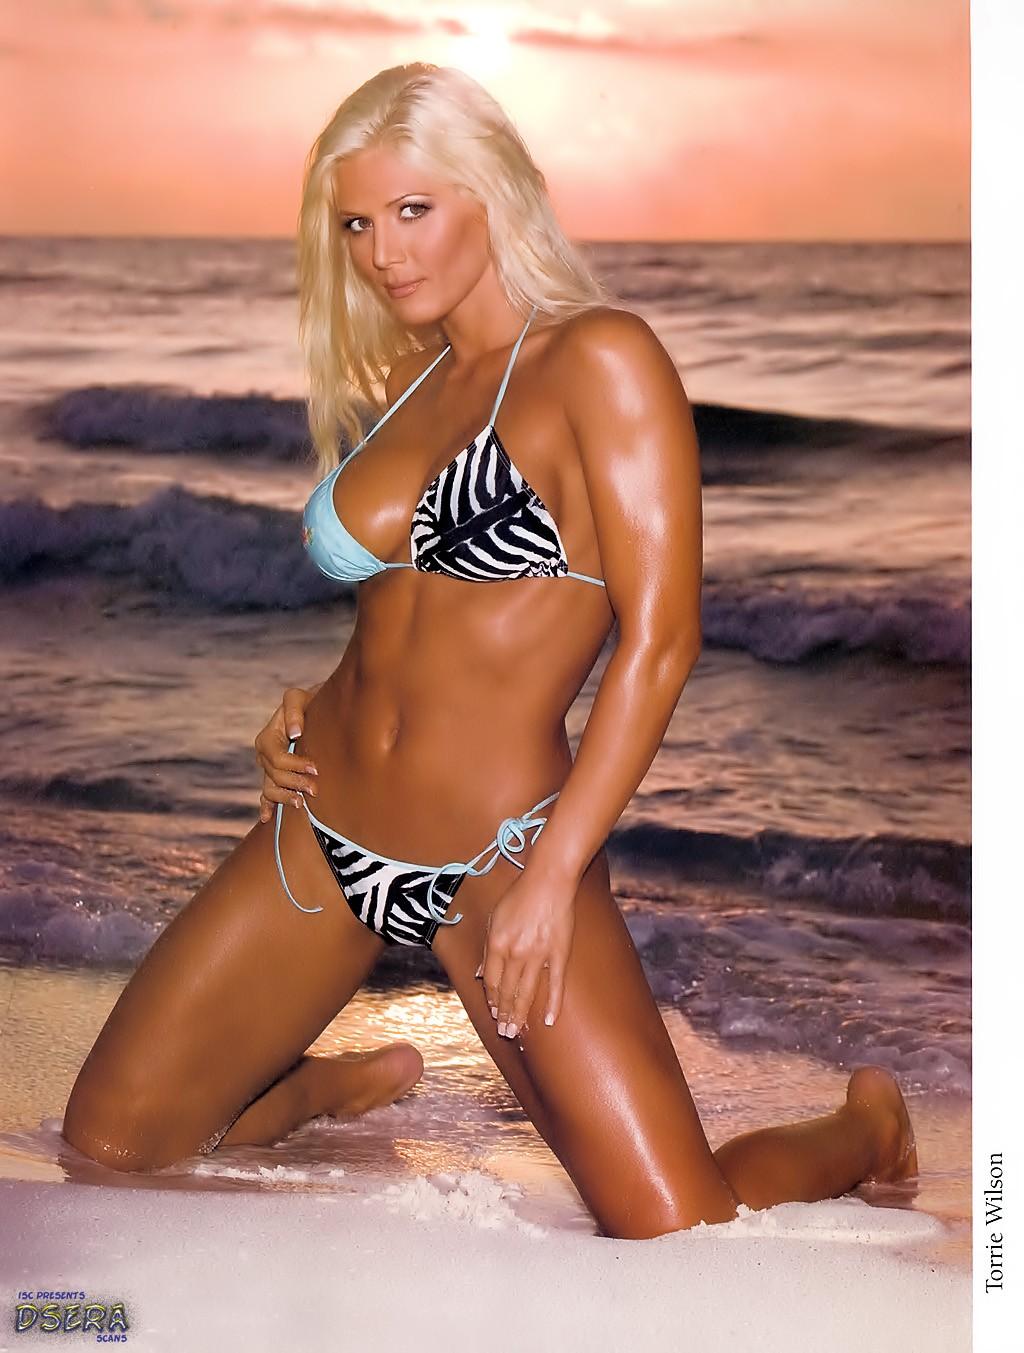 Natalie Gulbis Bikini Bilder